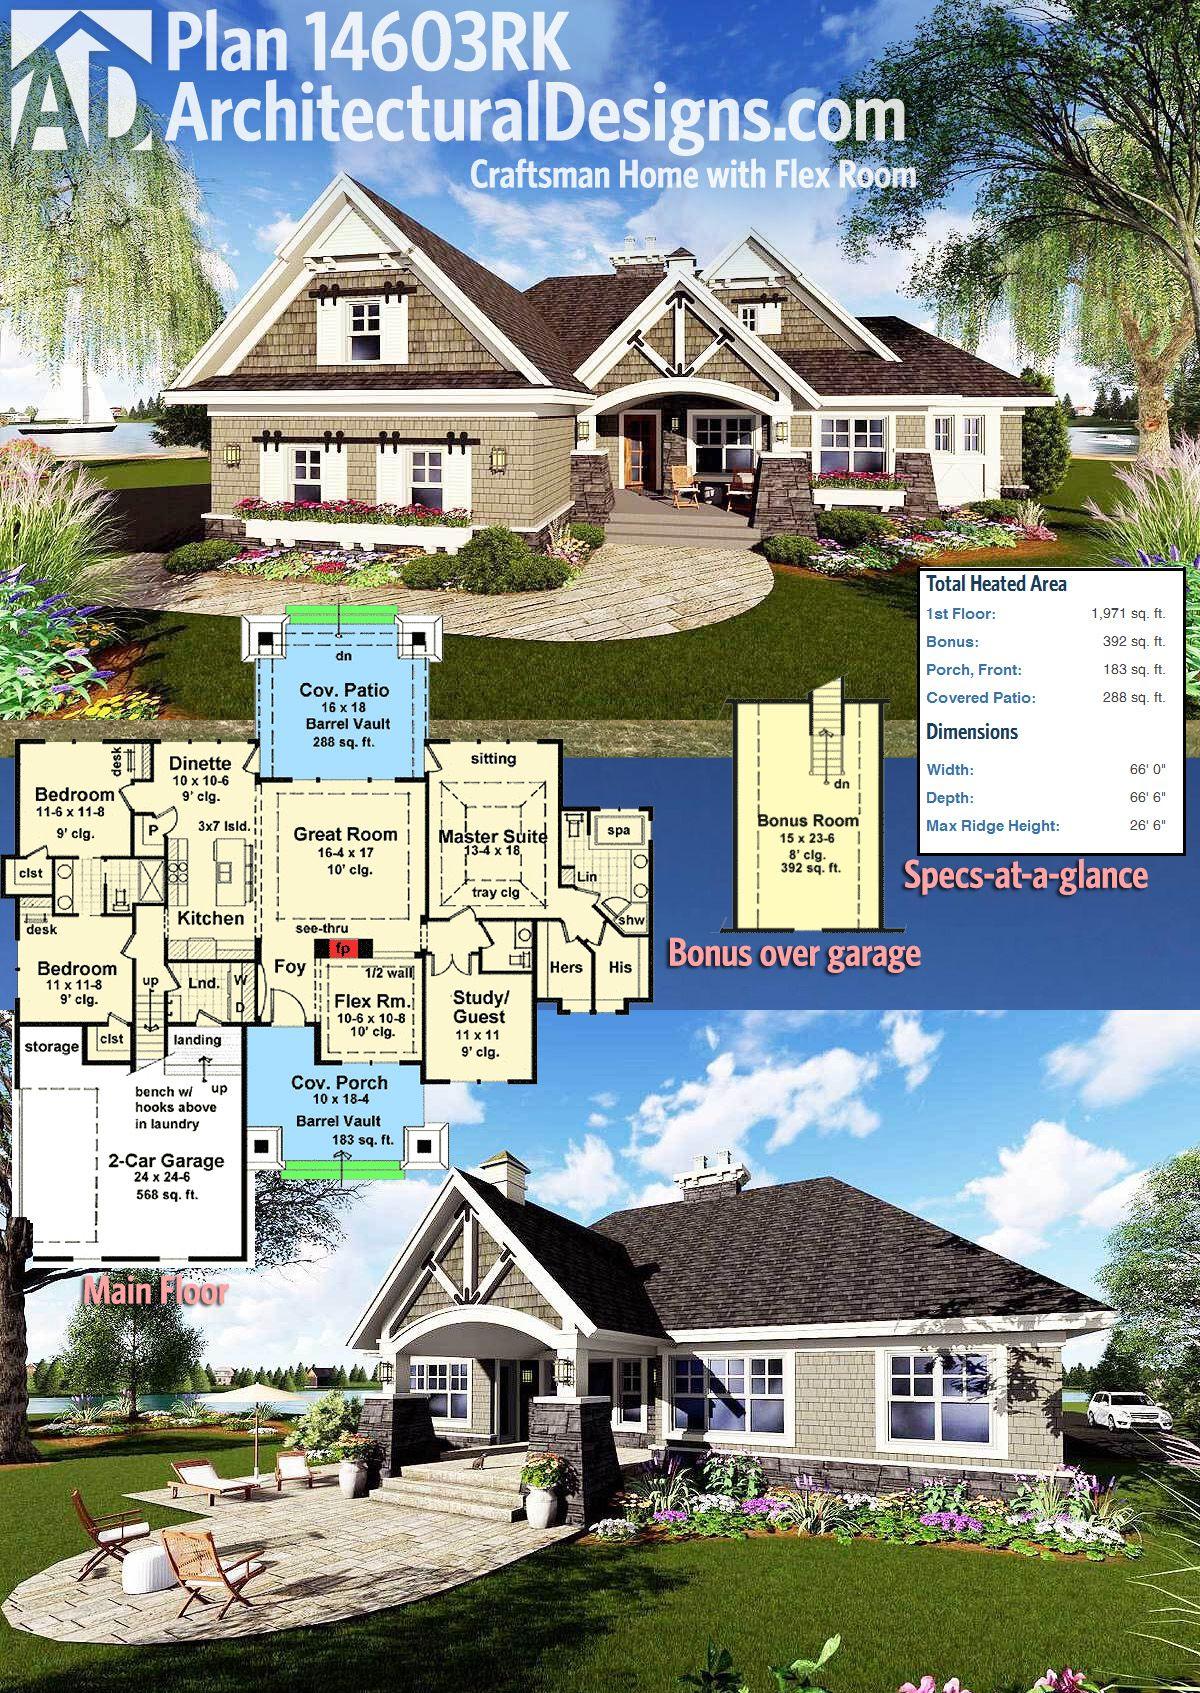 Architectural Designs Craftsman House Plan 14603RK has